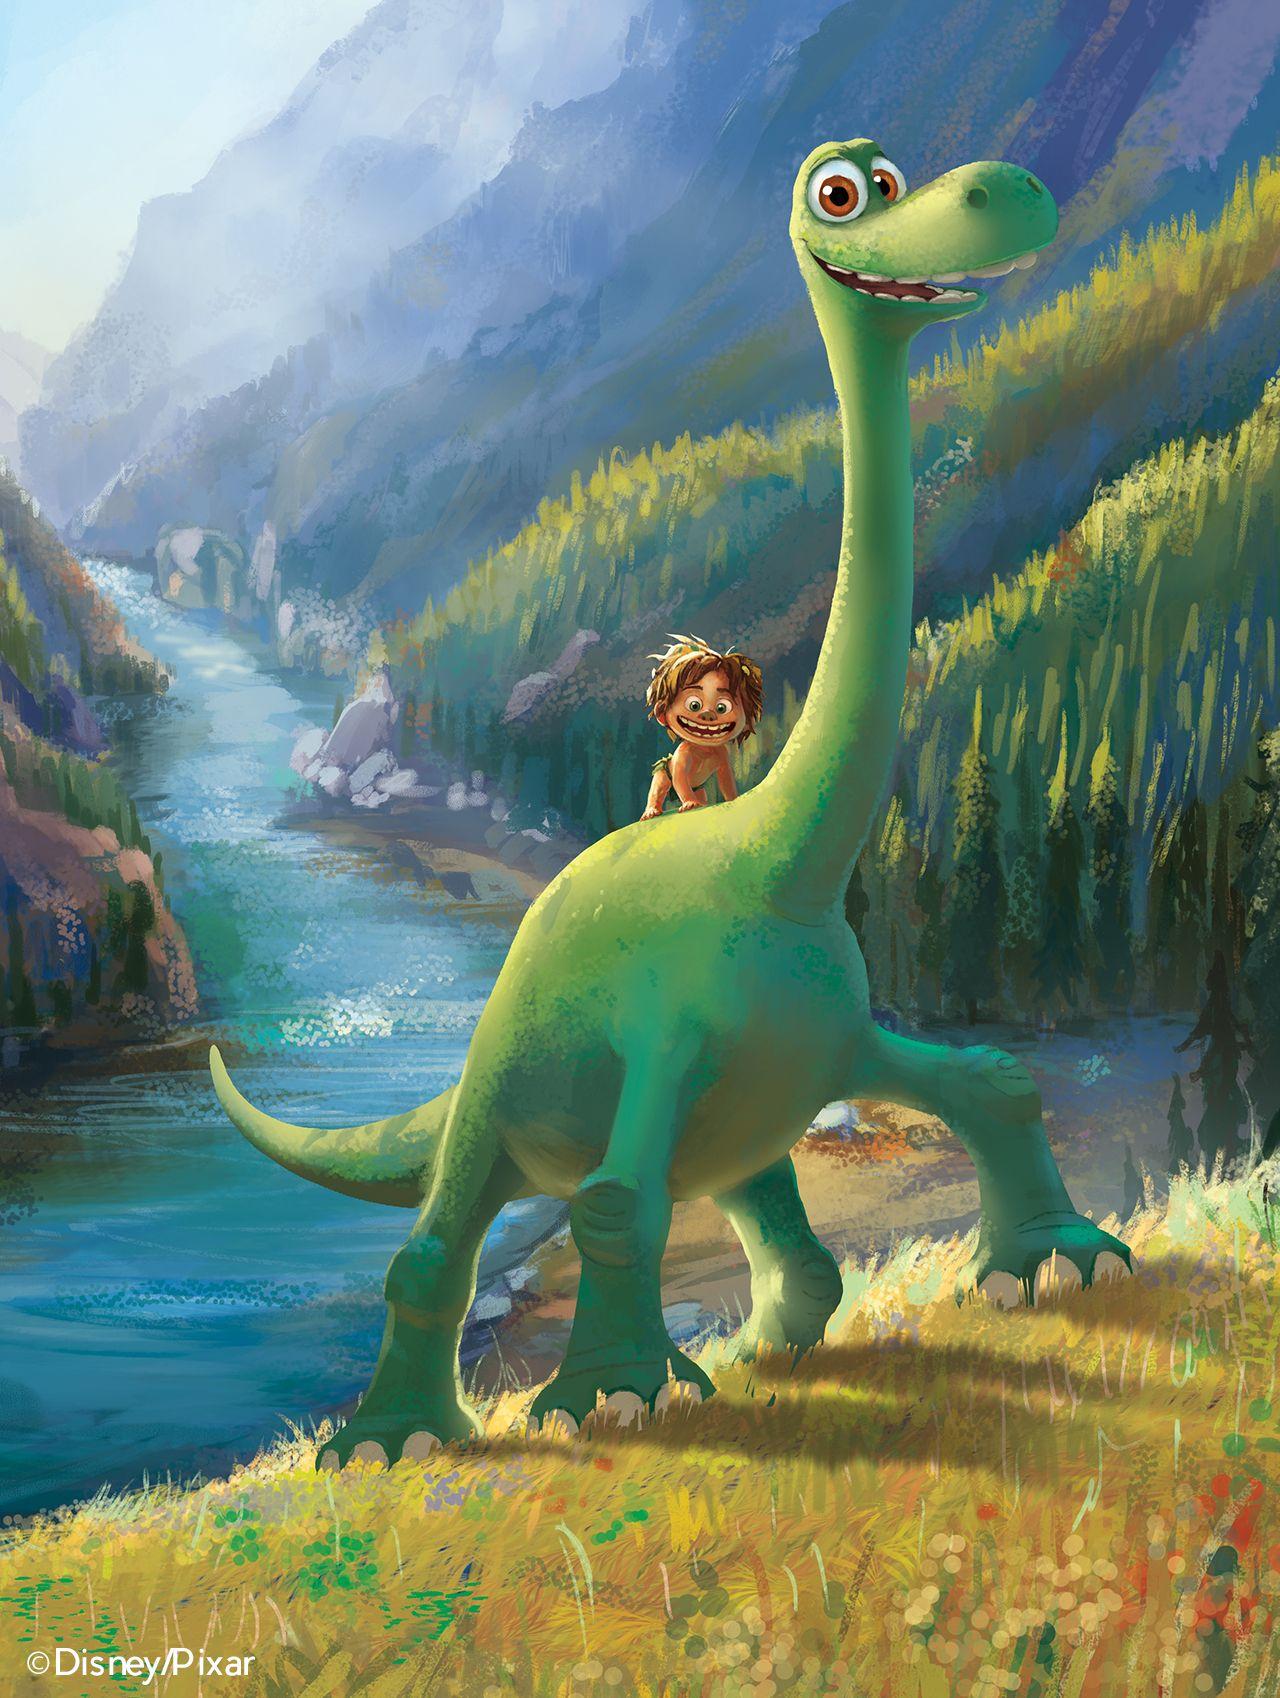 Lucapisanu Another Color Key For The Good Dinosaur Guys